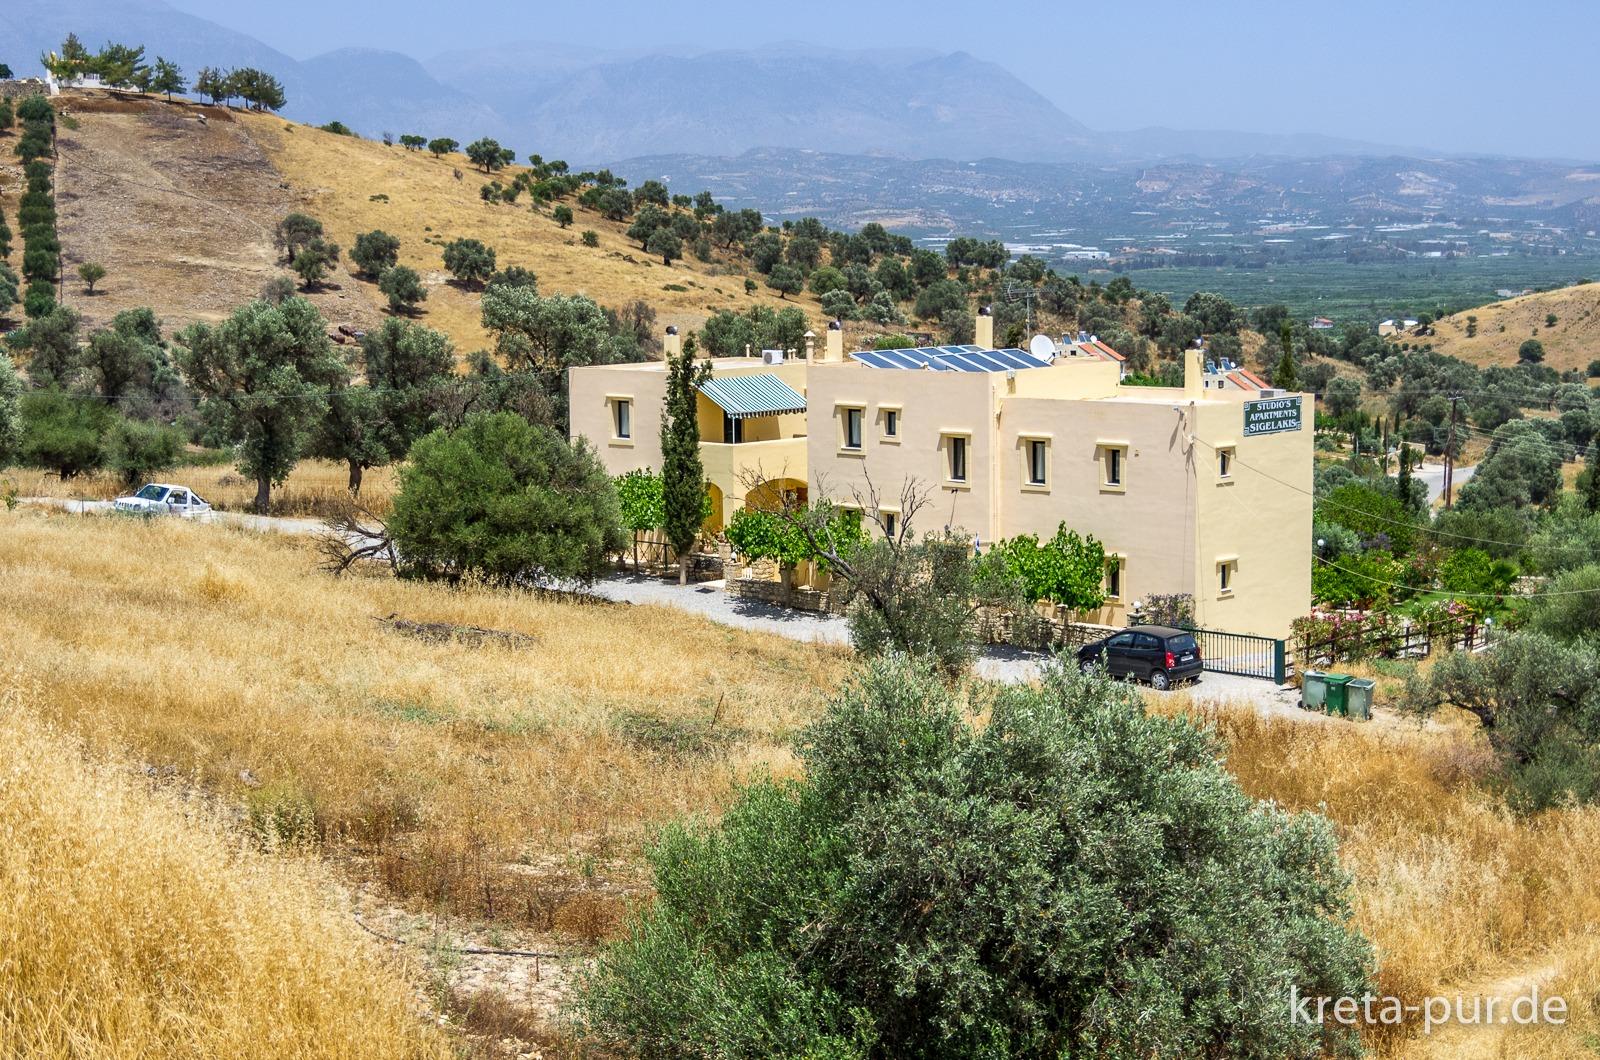 Blick vom Ort aus auf die Studios Sigelakis in Sivas